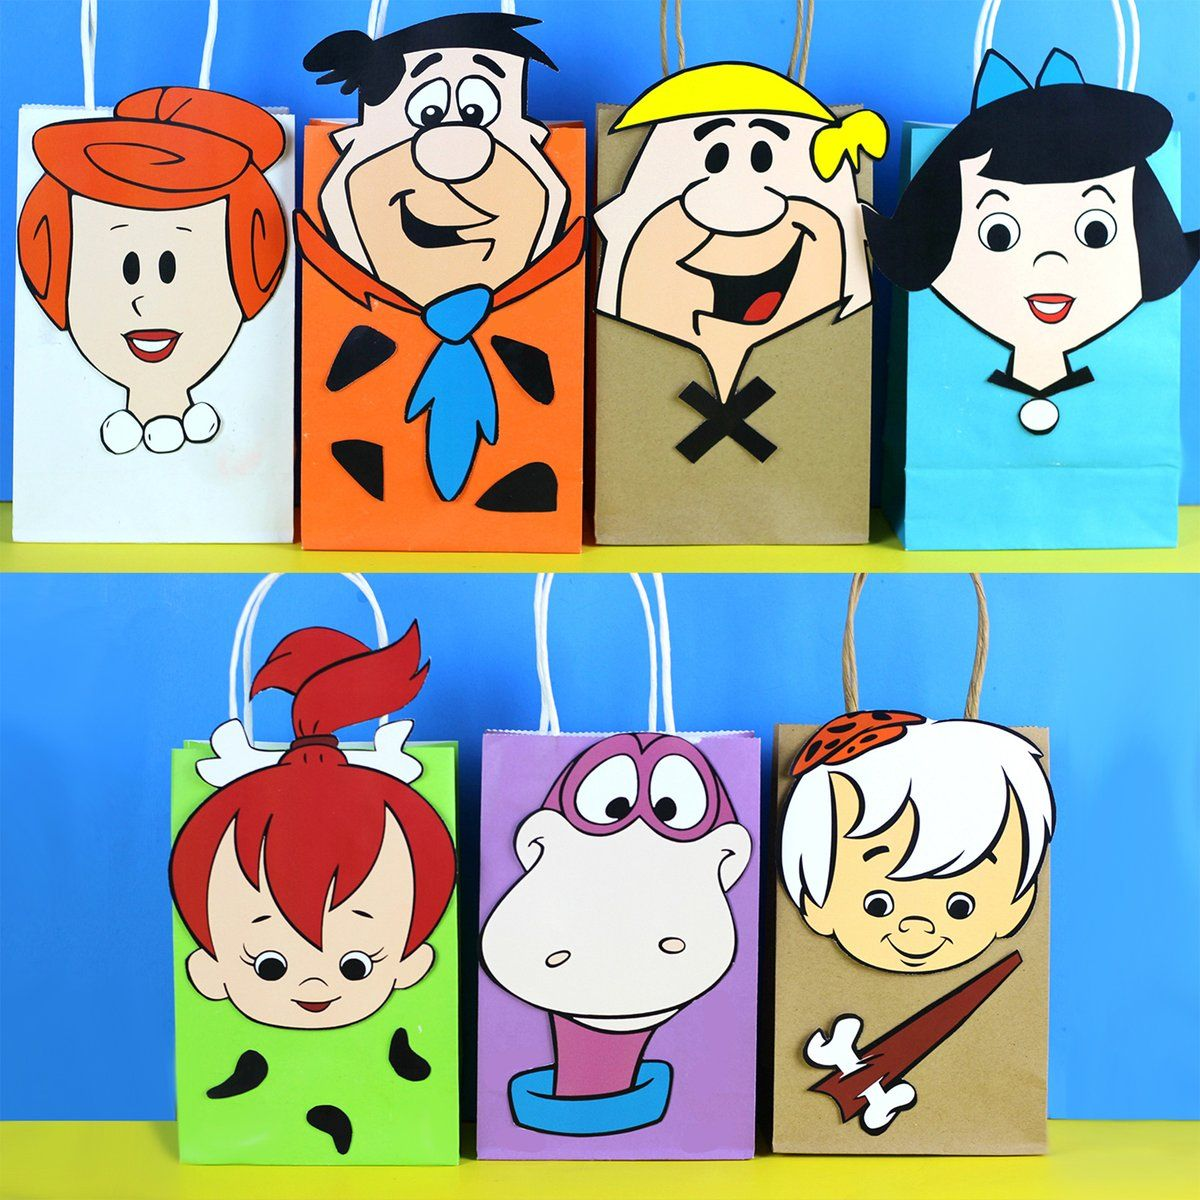 Purse Los FlintstonesThe Flintstones